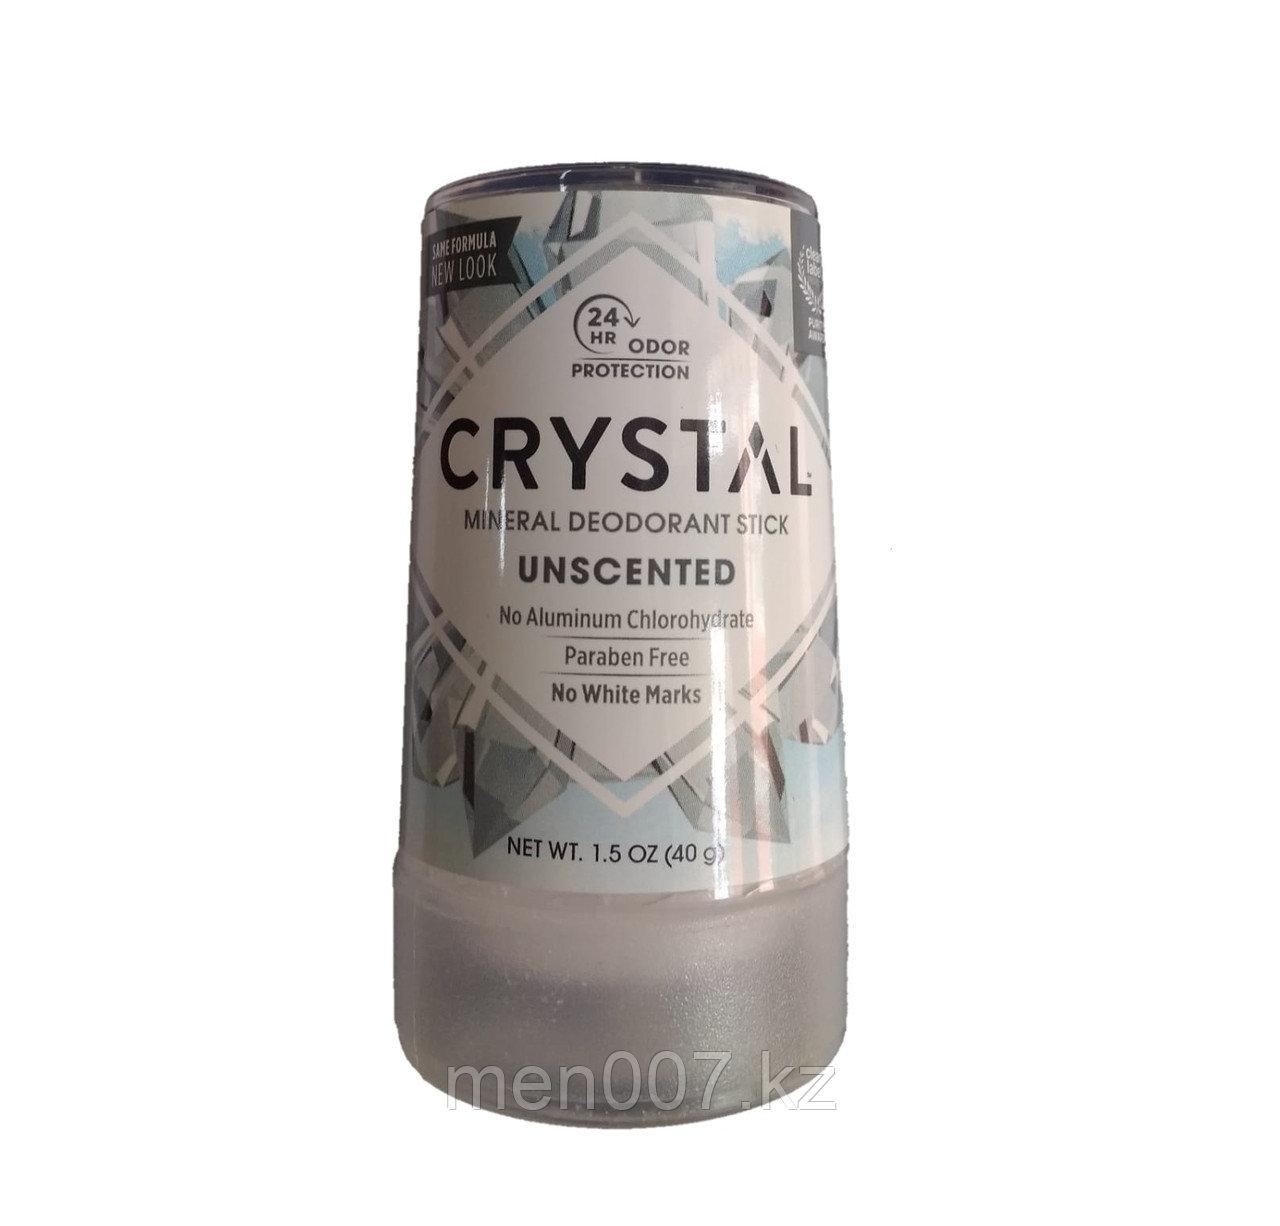 Crystal Минеральный дезодорант-карандаш(антиперспирант) 40 г